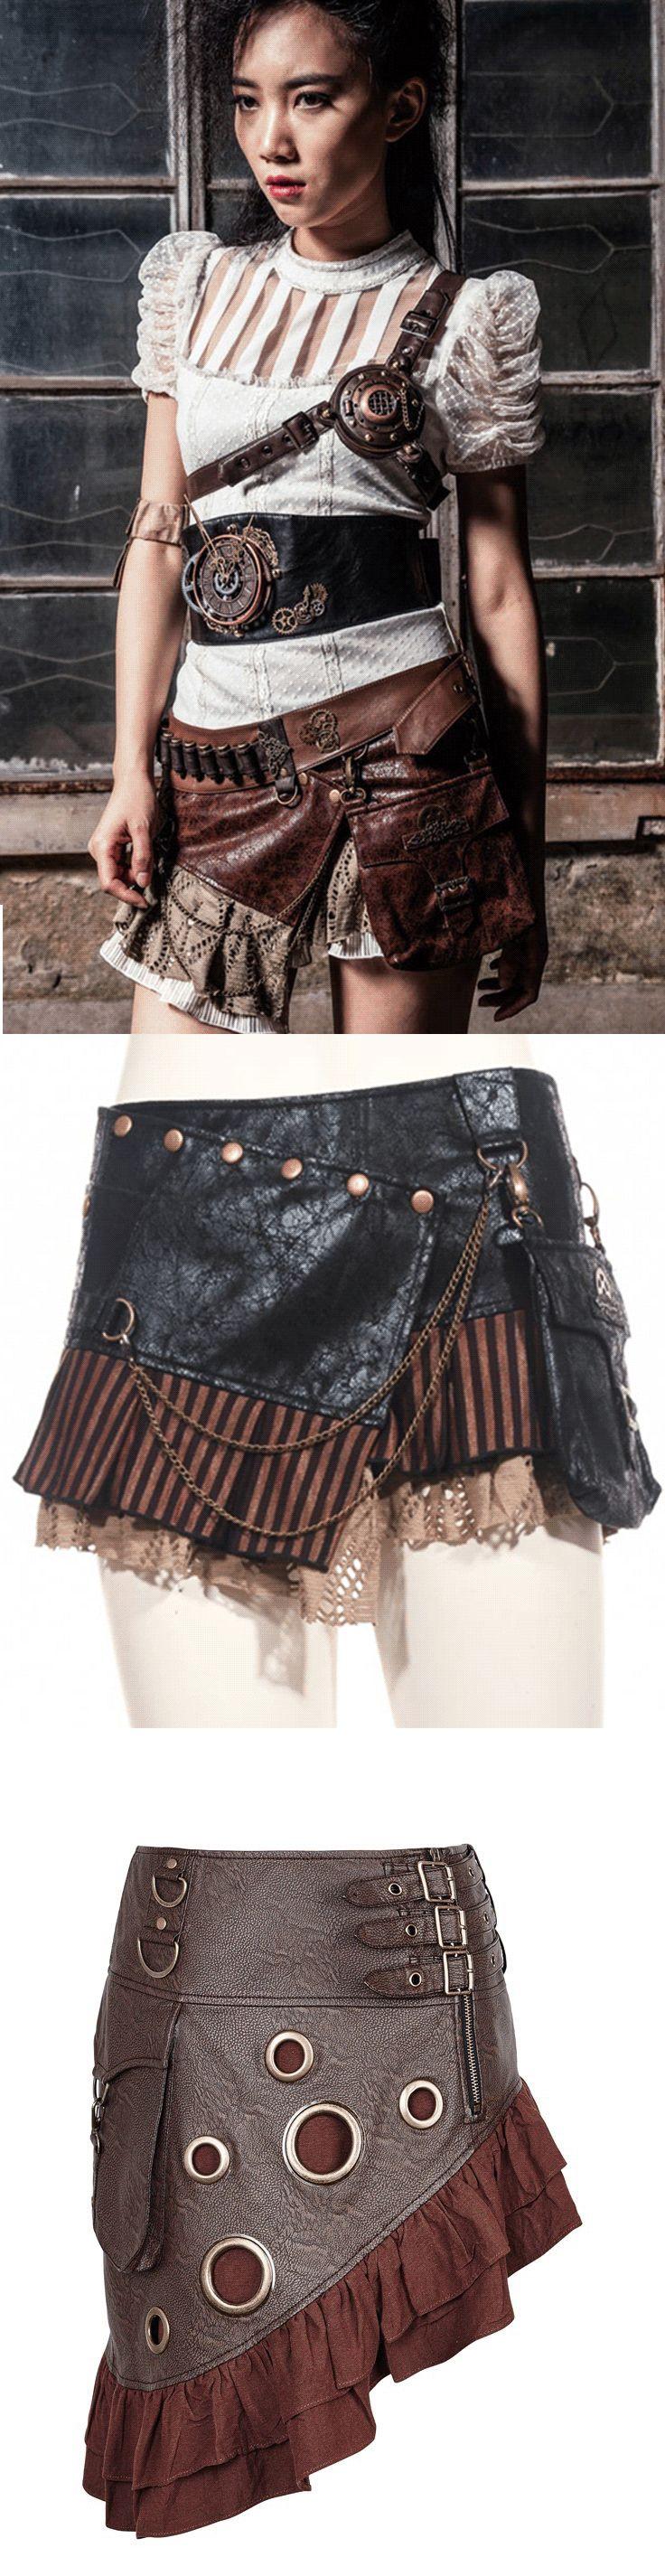 Shop Steampunk Victorian mini skirts at RebelsMarket.